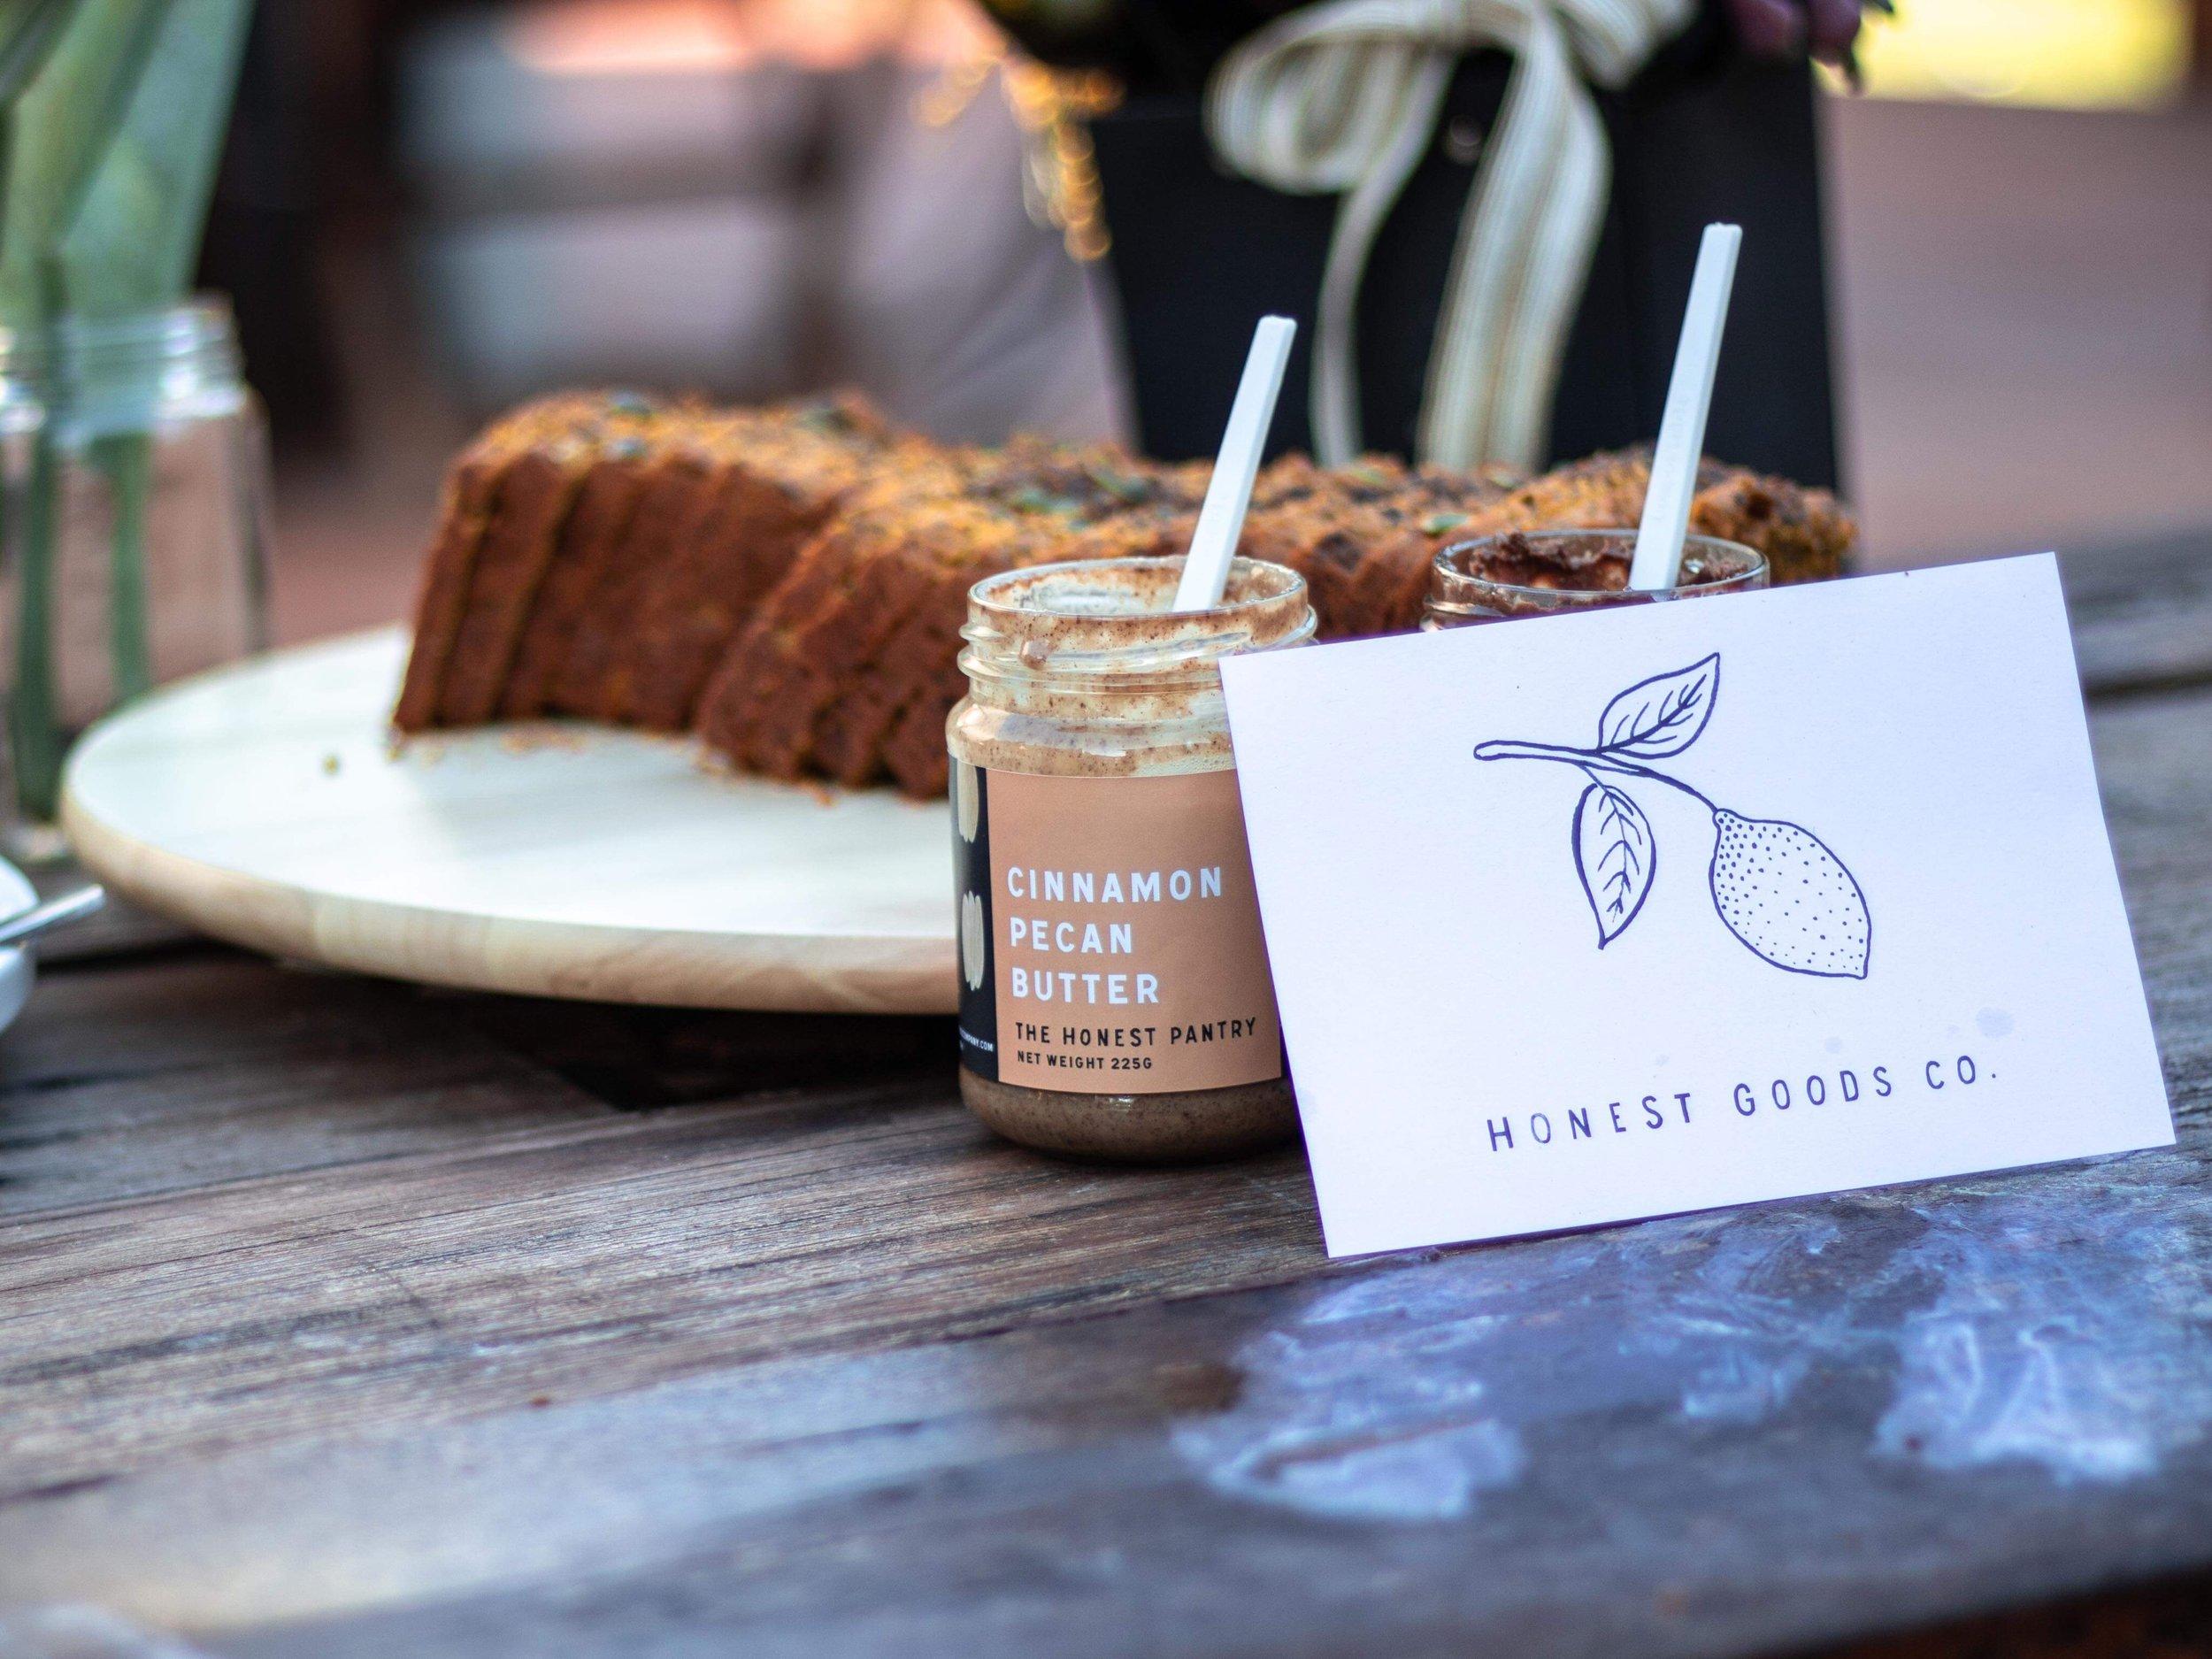 Brekky at a recent Bare & Wilde wellness. retreatHonest Goods Co. Paleo Pumpkin Loaf with The Honest Pantry Cinnamon Pecan Butter